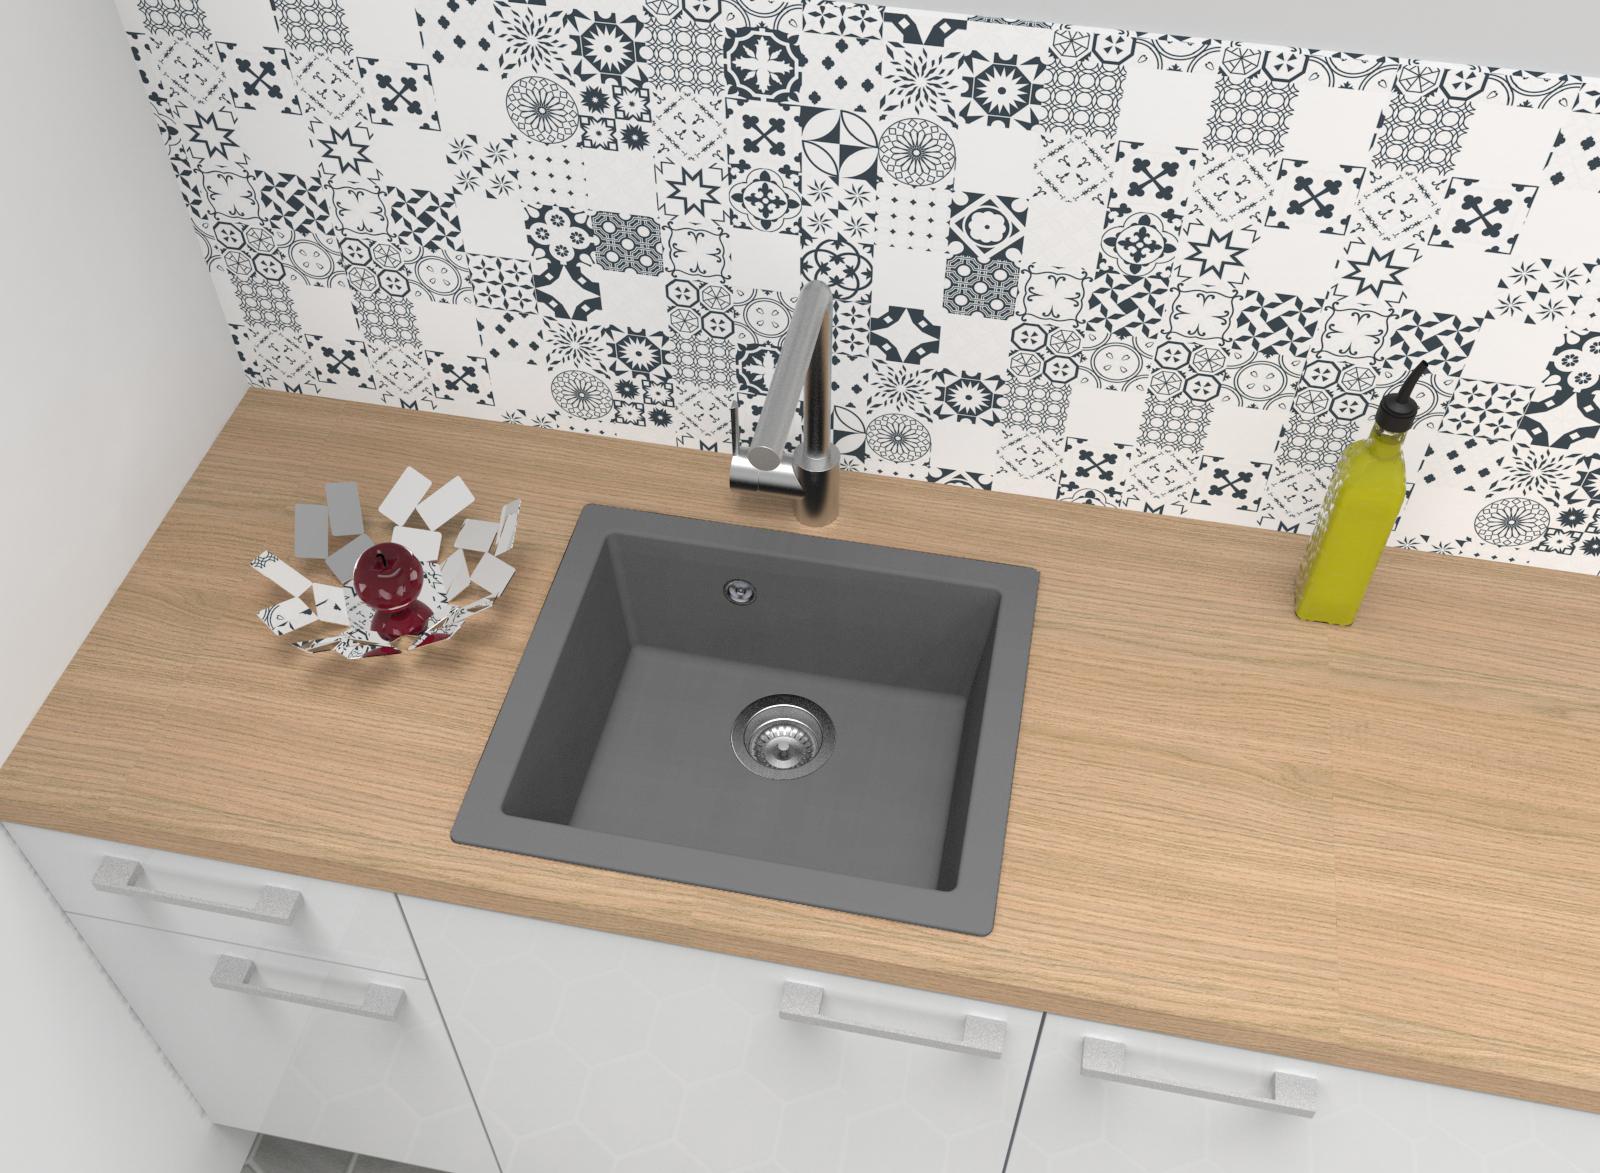 Spüle Küchenspüle Einbauspüle Spülbecken Granit Mineralite 50 x 44 grau respekta